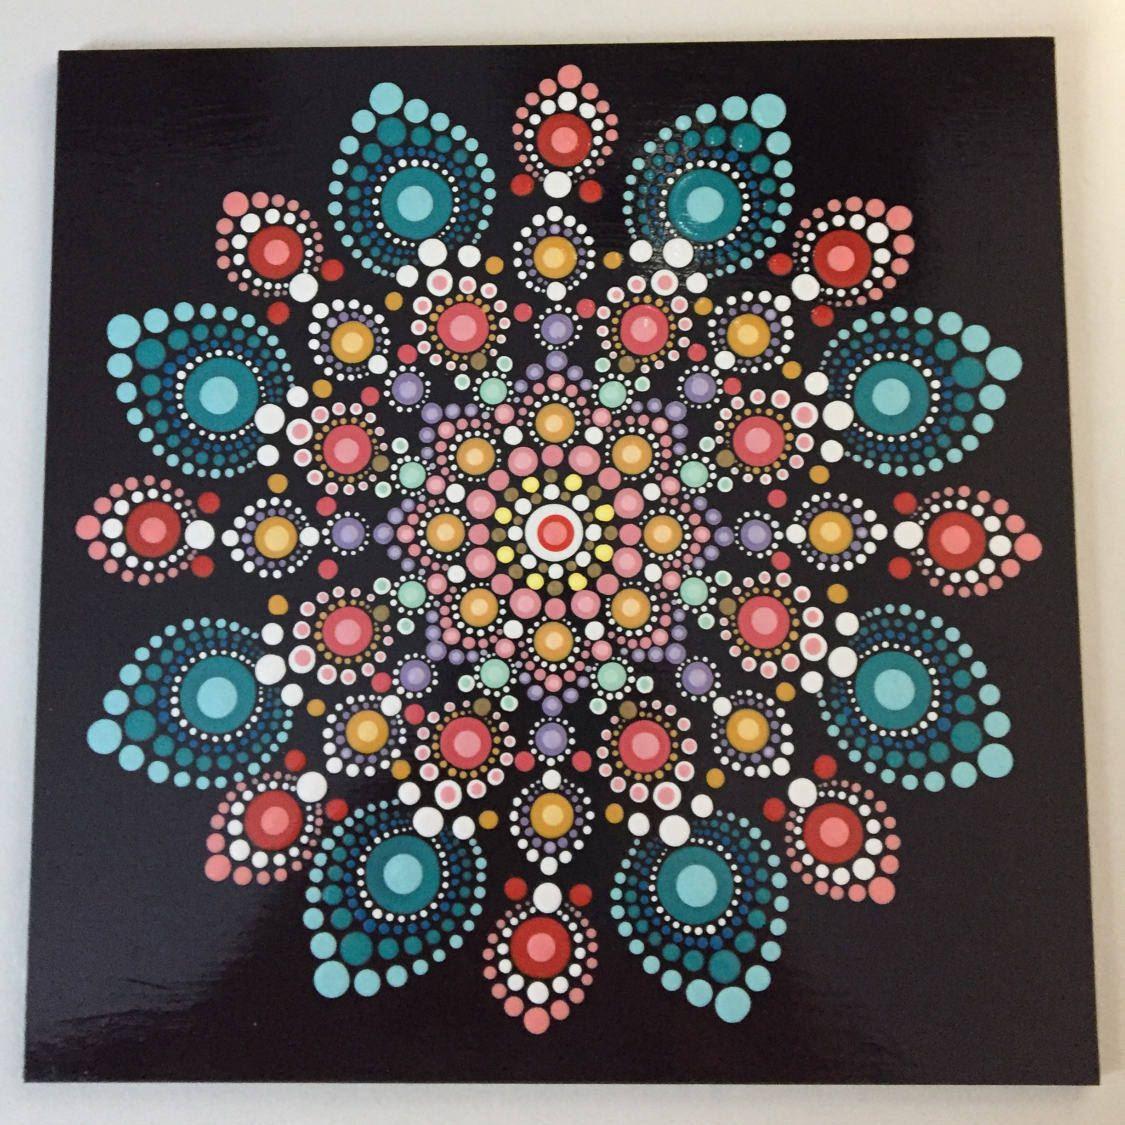 Hand Painted Mandala Artist Panel Meditation Dot Art Calming Healing #459